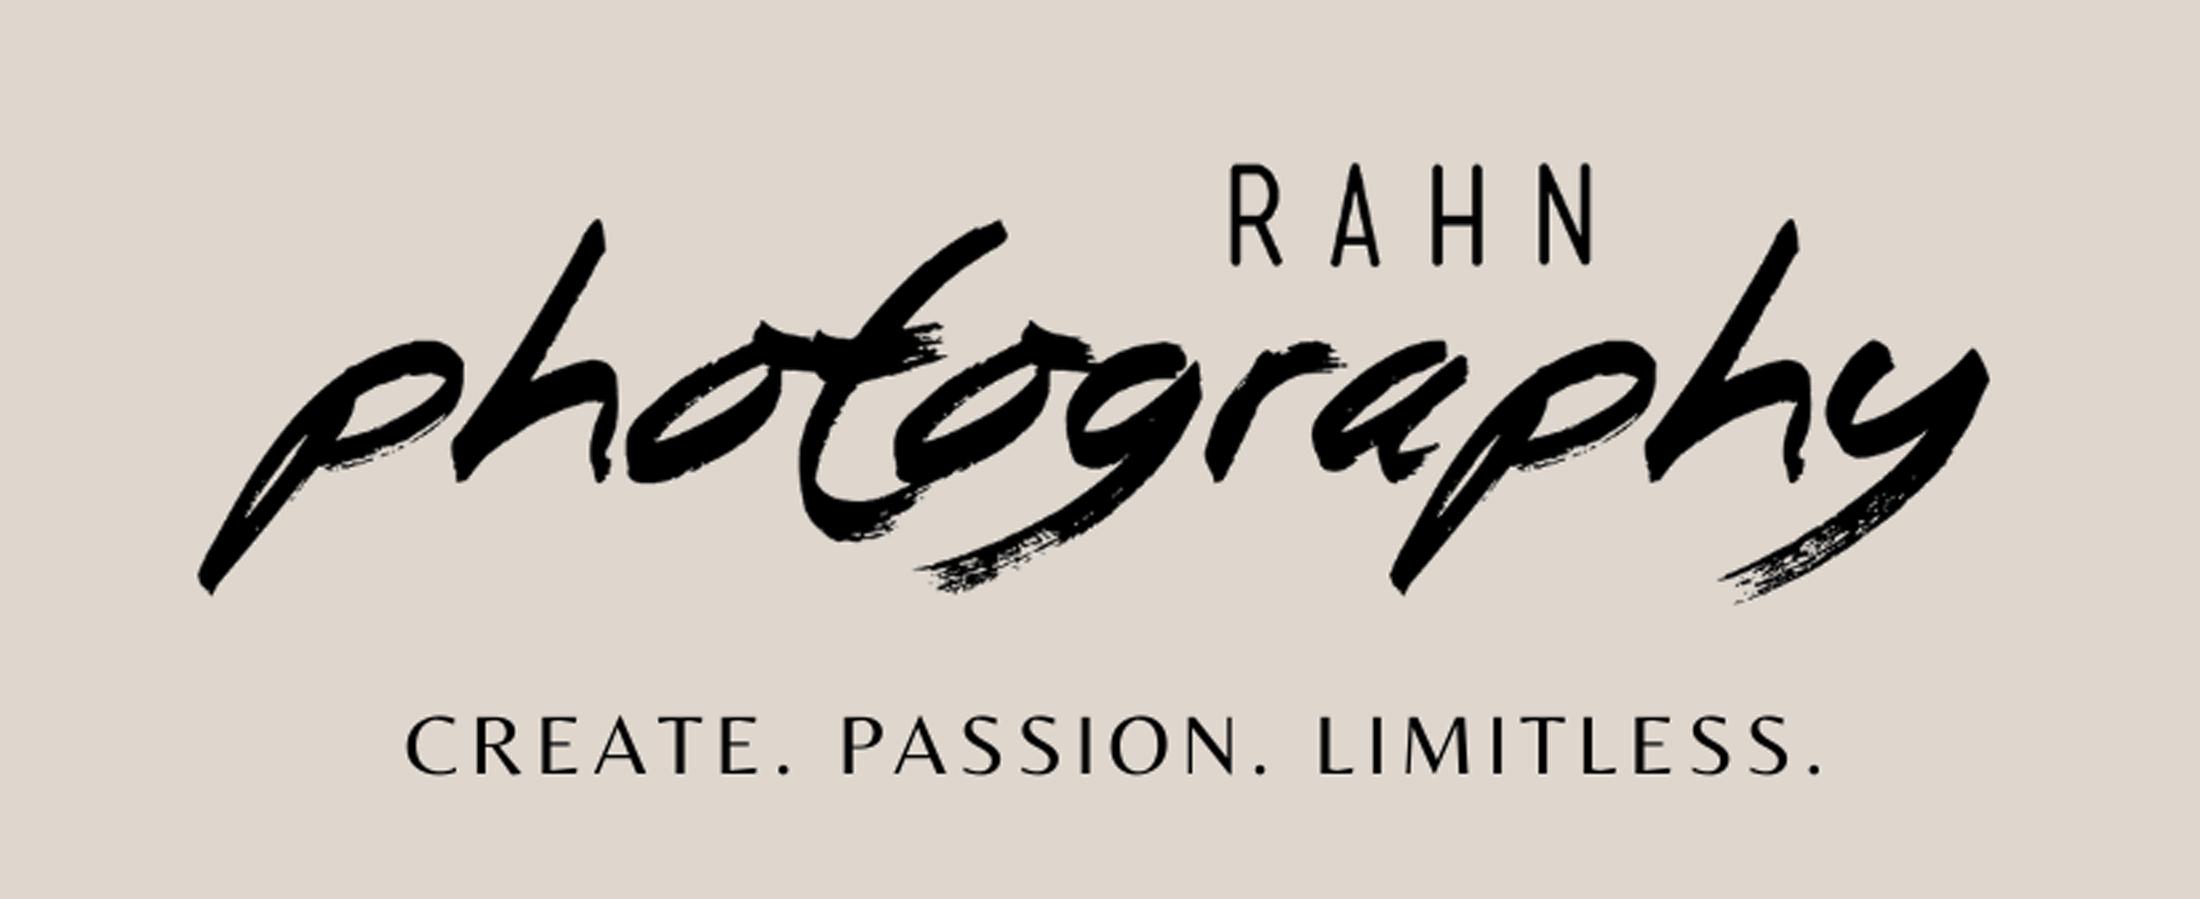 Rahn Photography